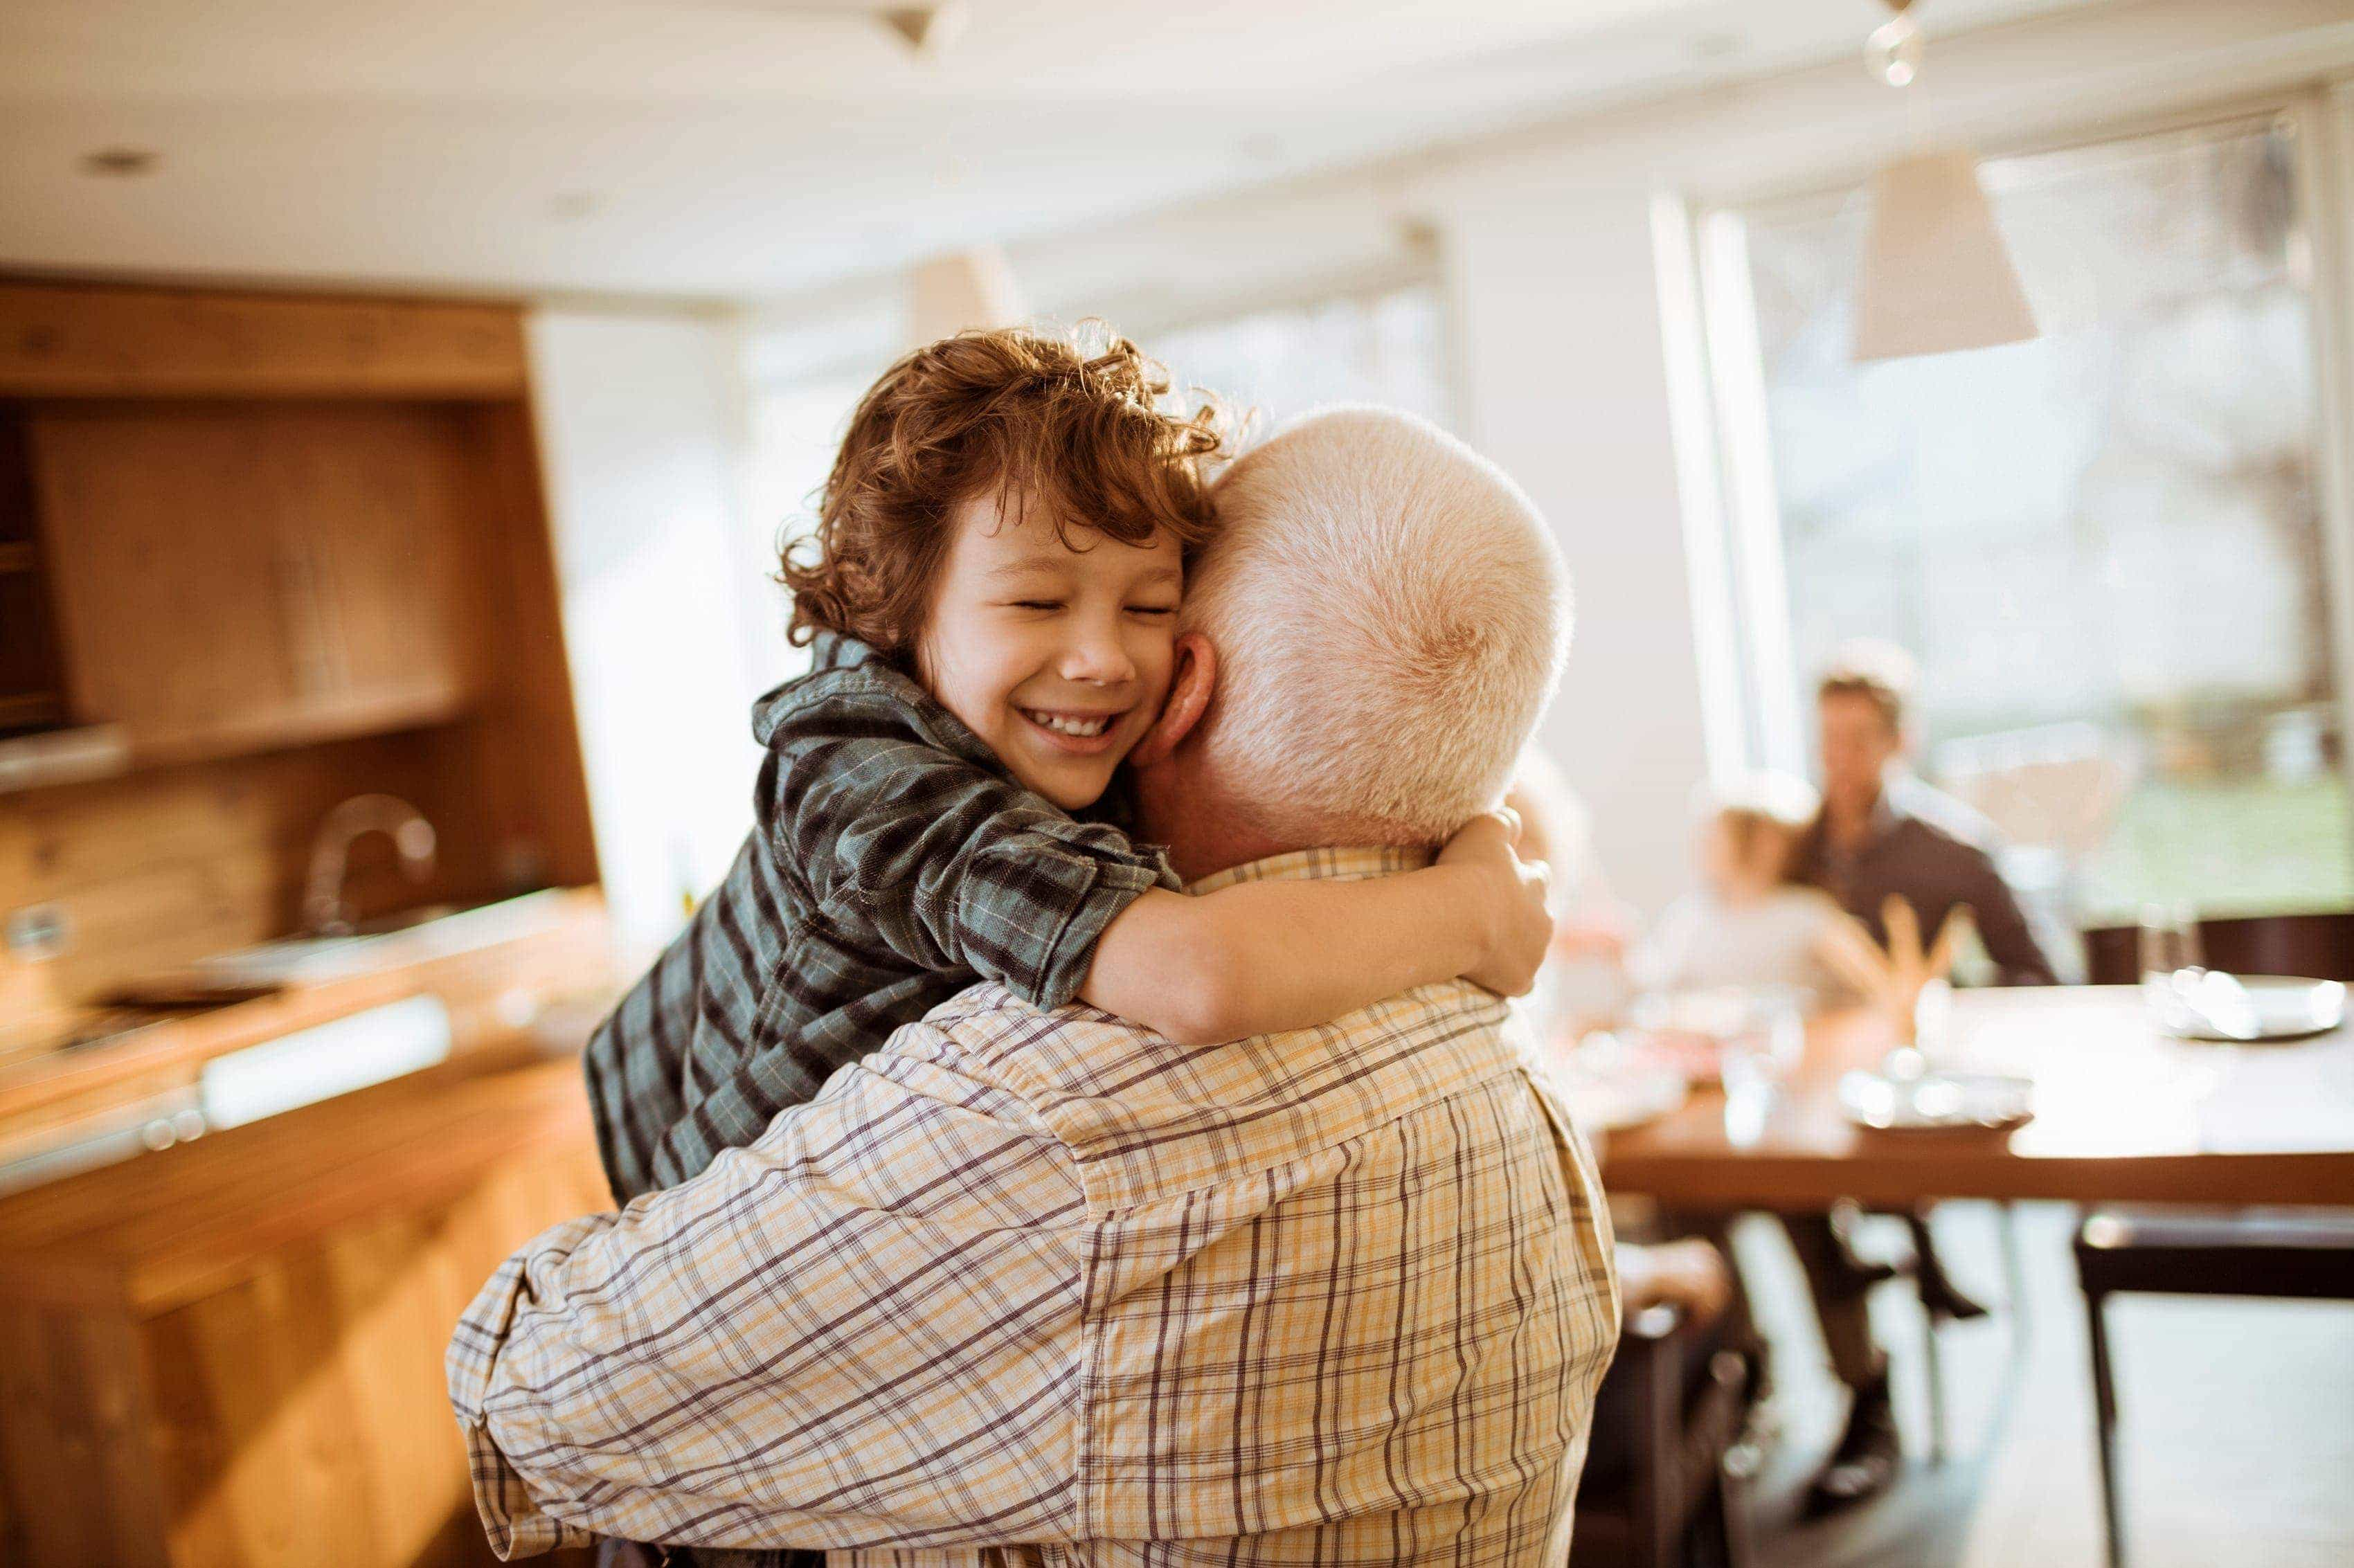 A grandson hugging his grandpa